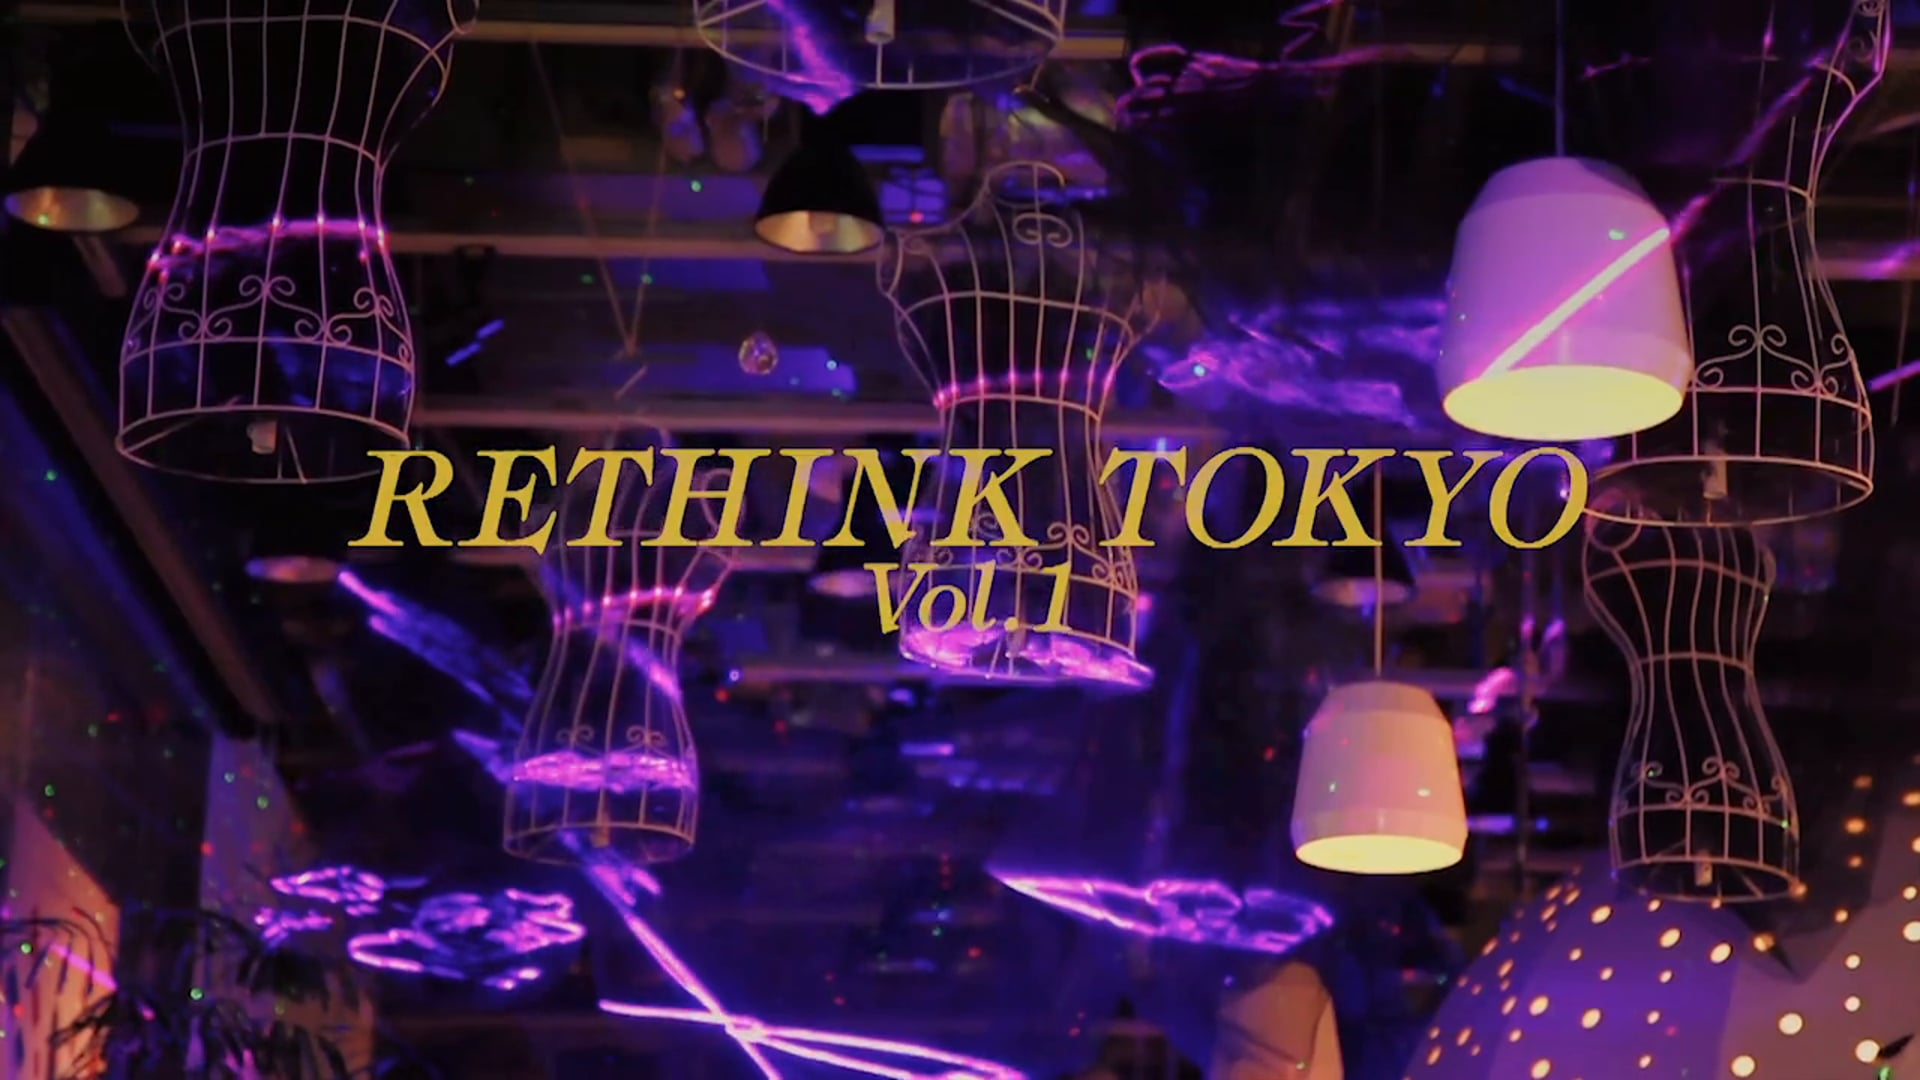 RETHINK TOKYO Vol.1 -Light wavers beautifully-